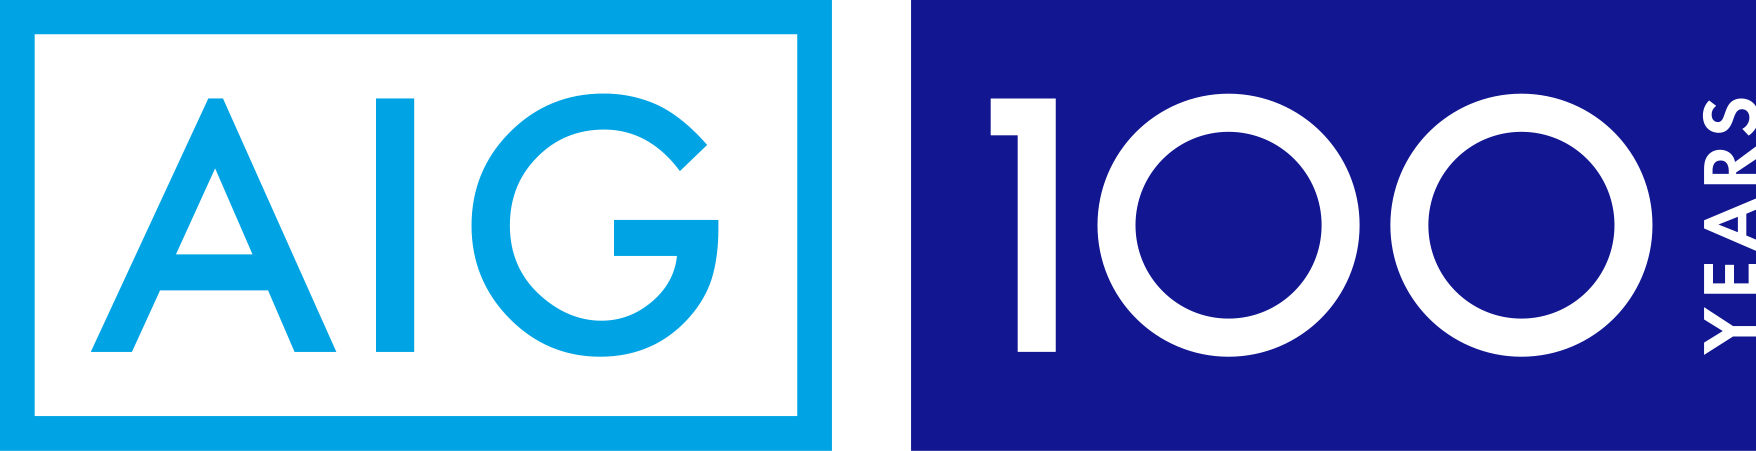 AIG_100_badge_rgb.png